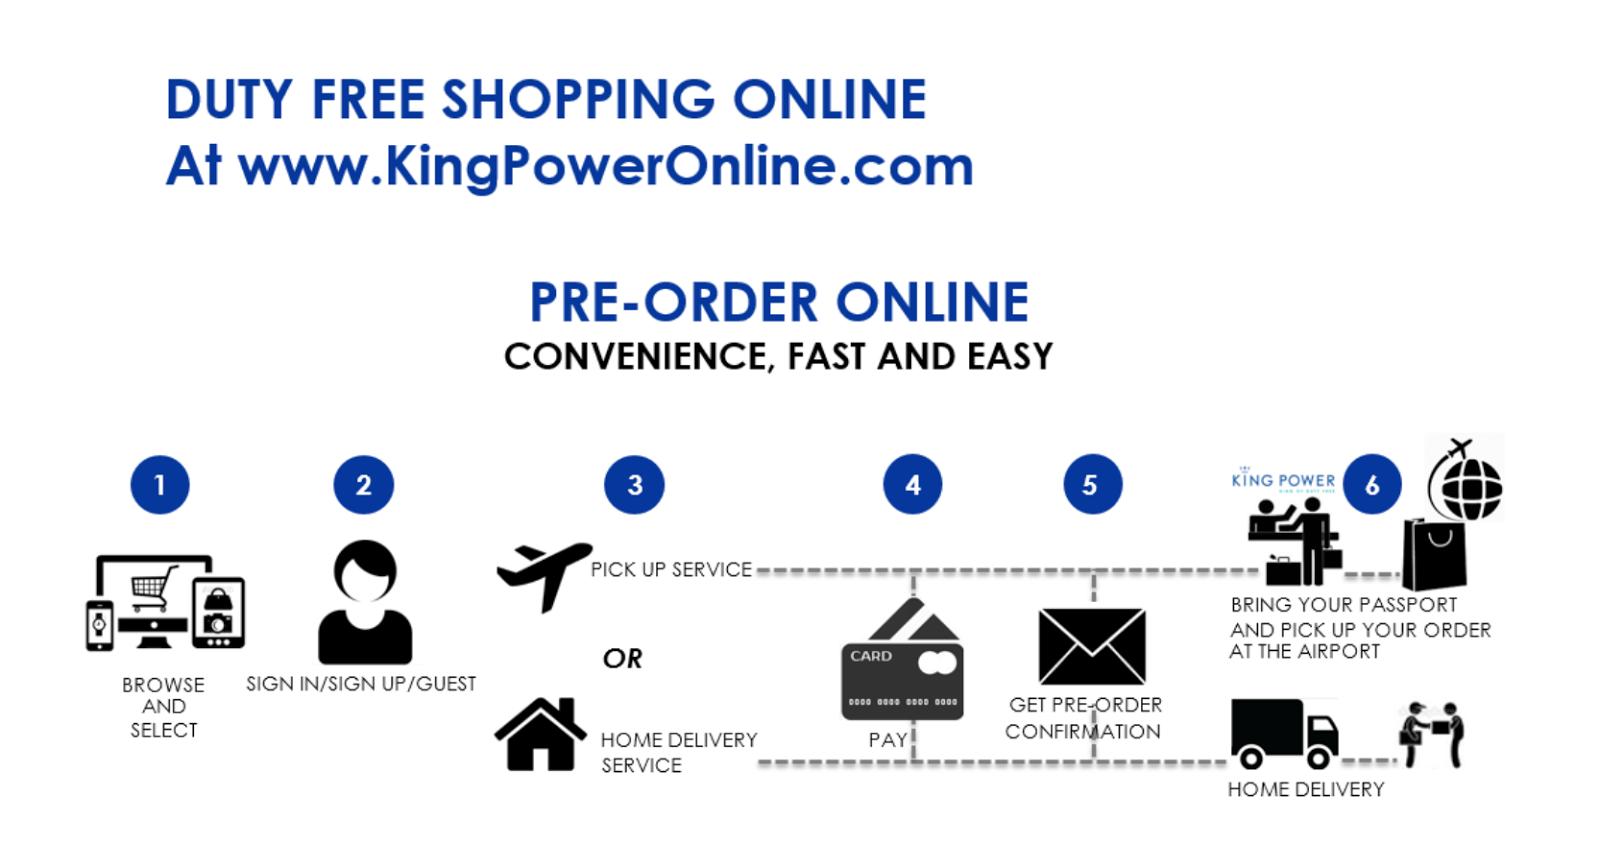 Kingpower Duty Free Thailand